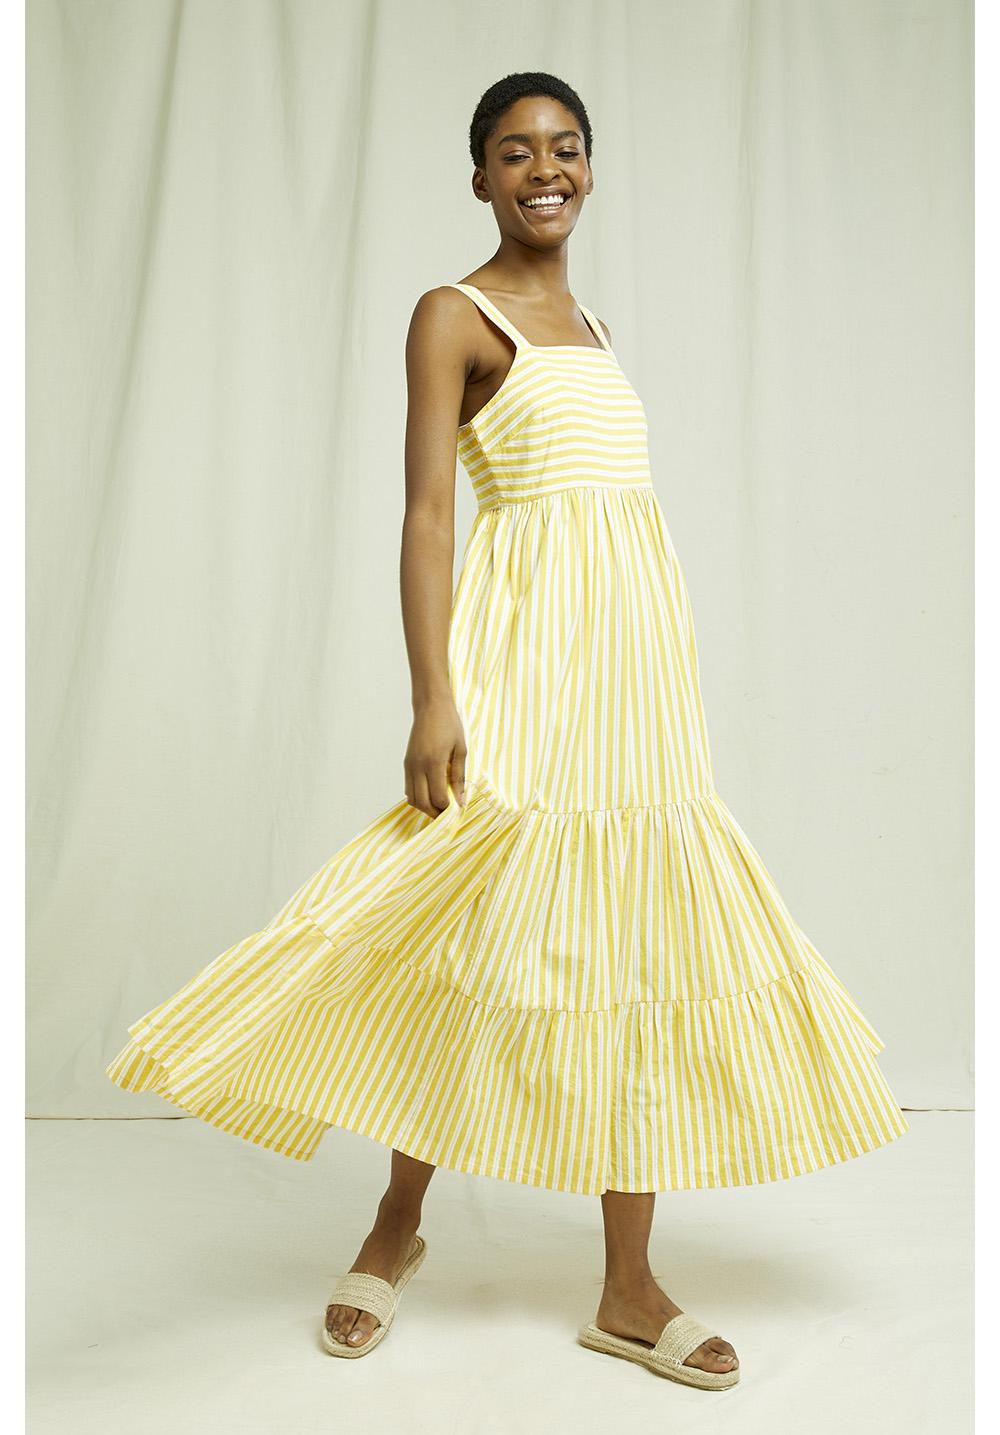 Lea Striped Dress In Yellow